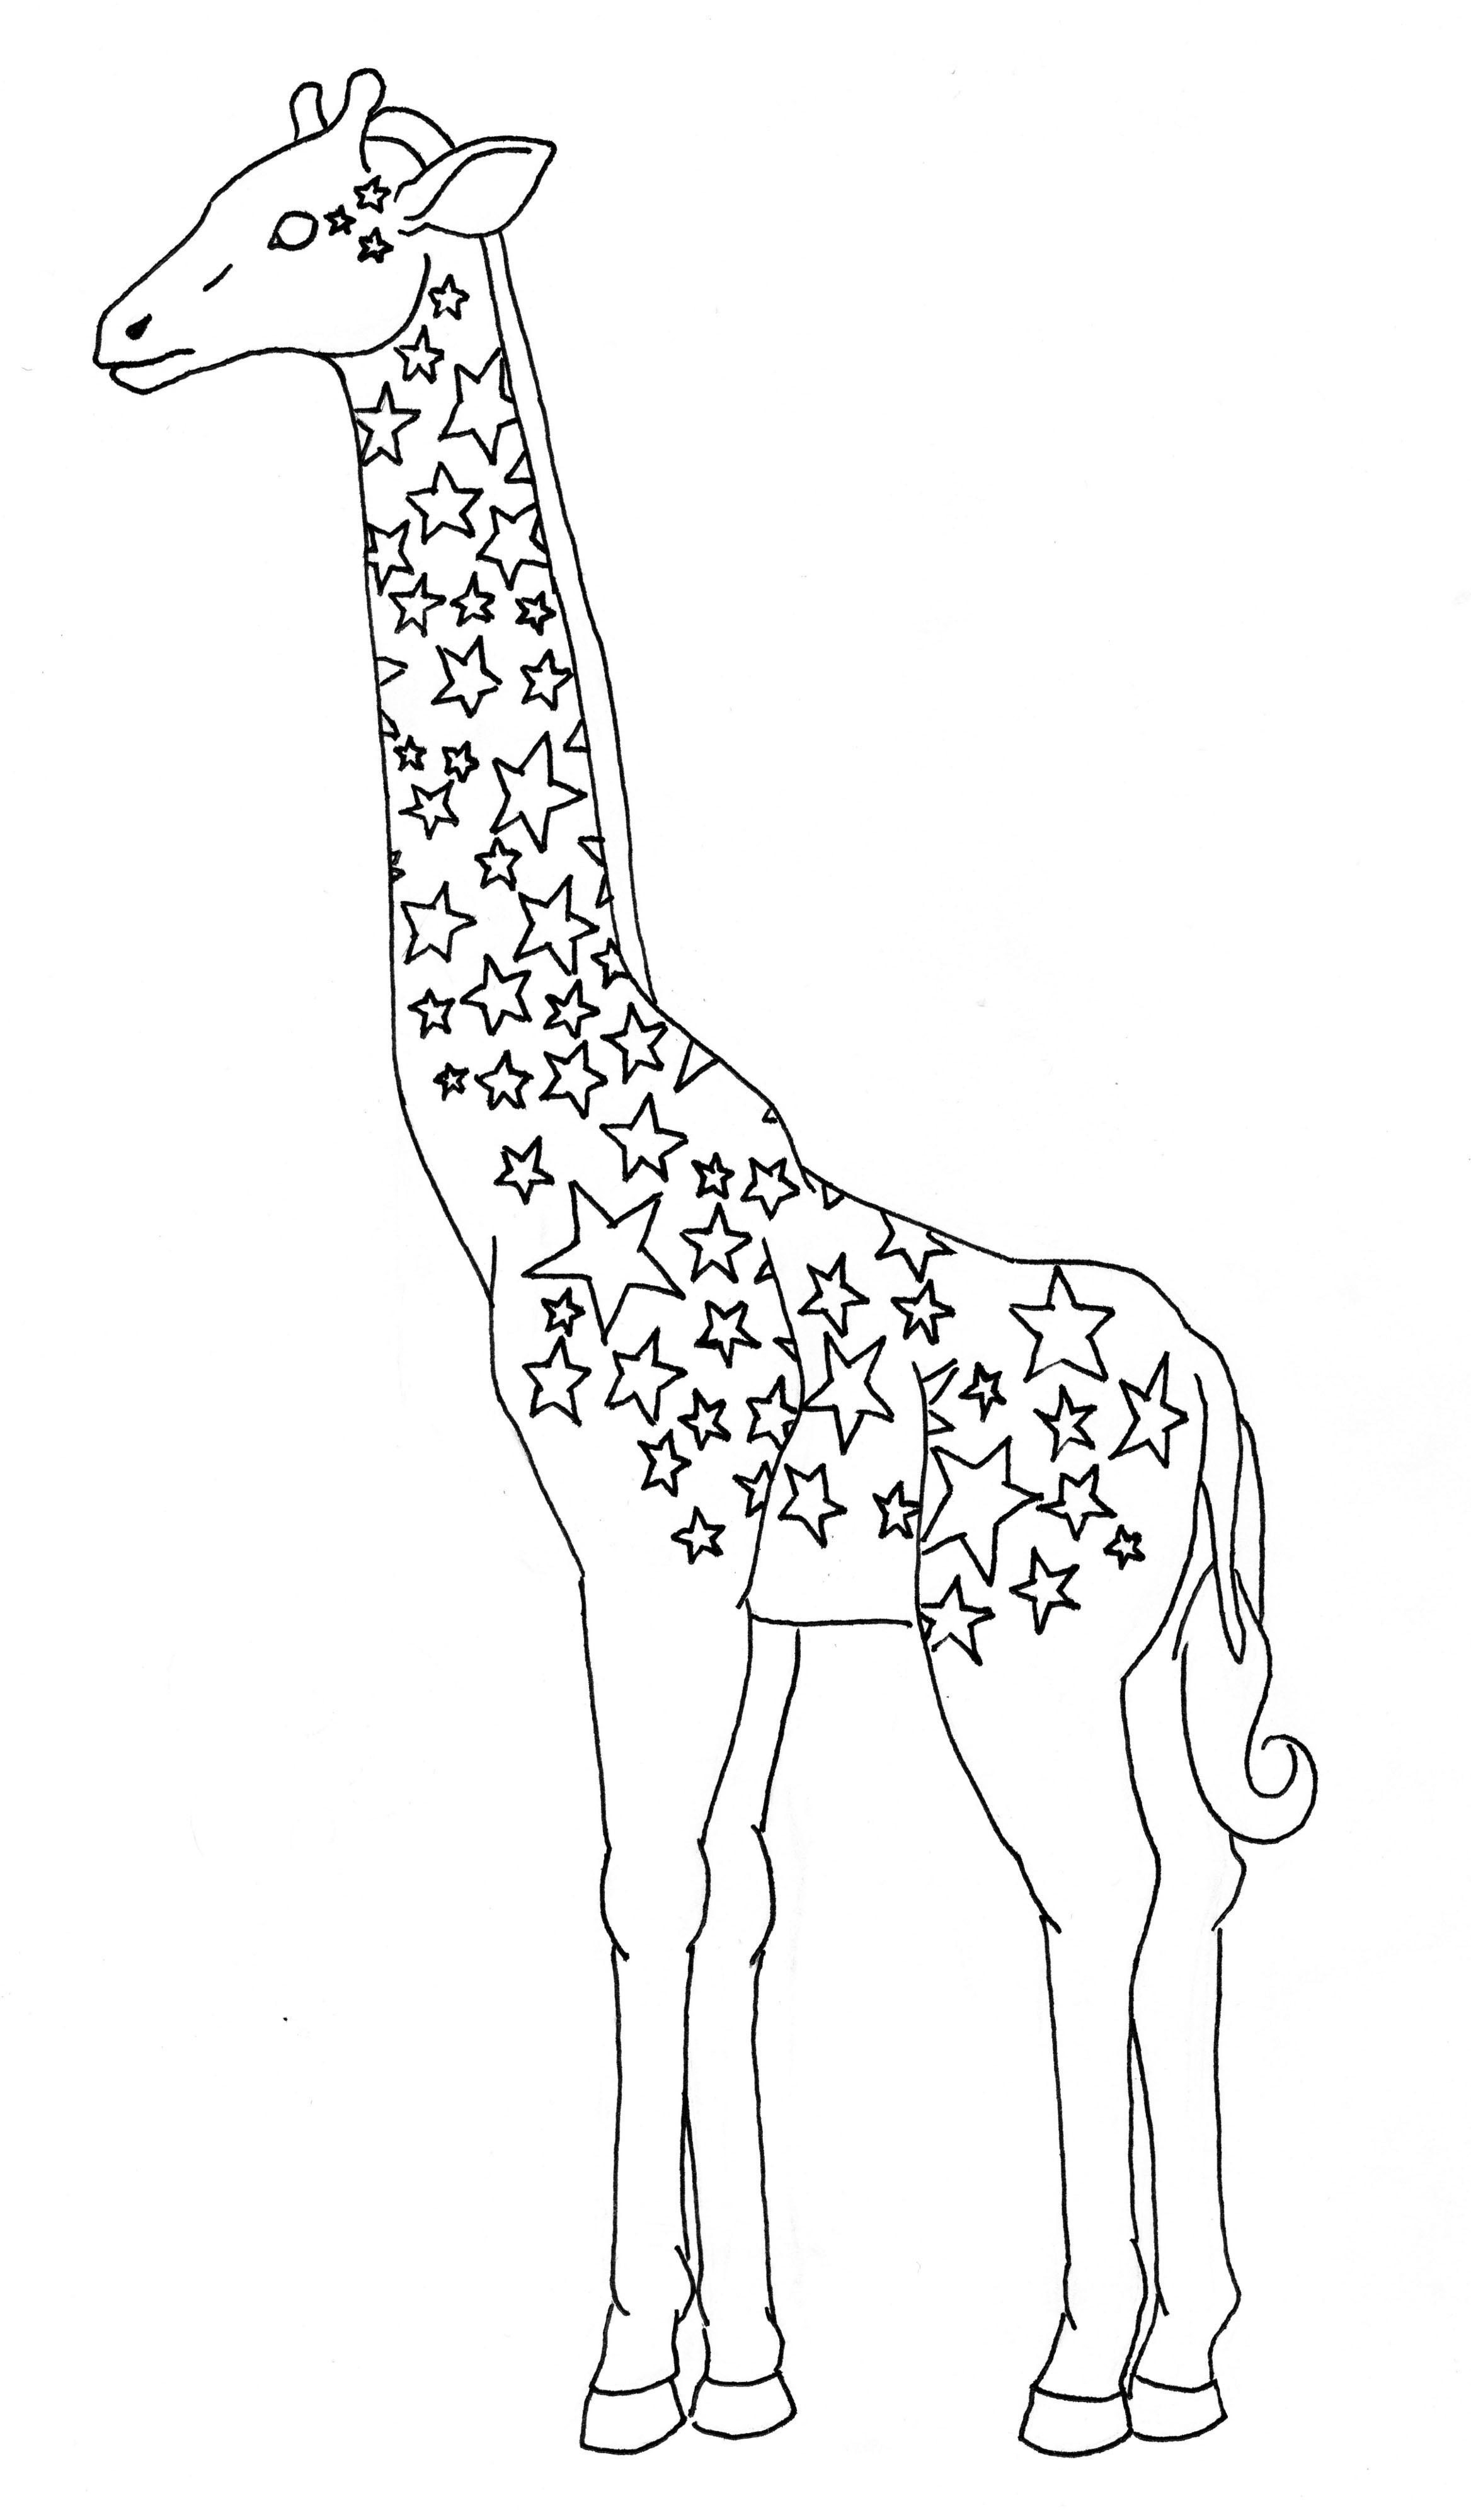 2335x4000 Giraffe Drawing Fresh Drawn Giraffe Side View Pencil And In Color